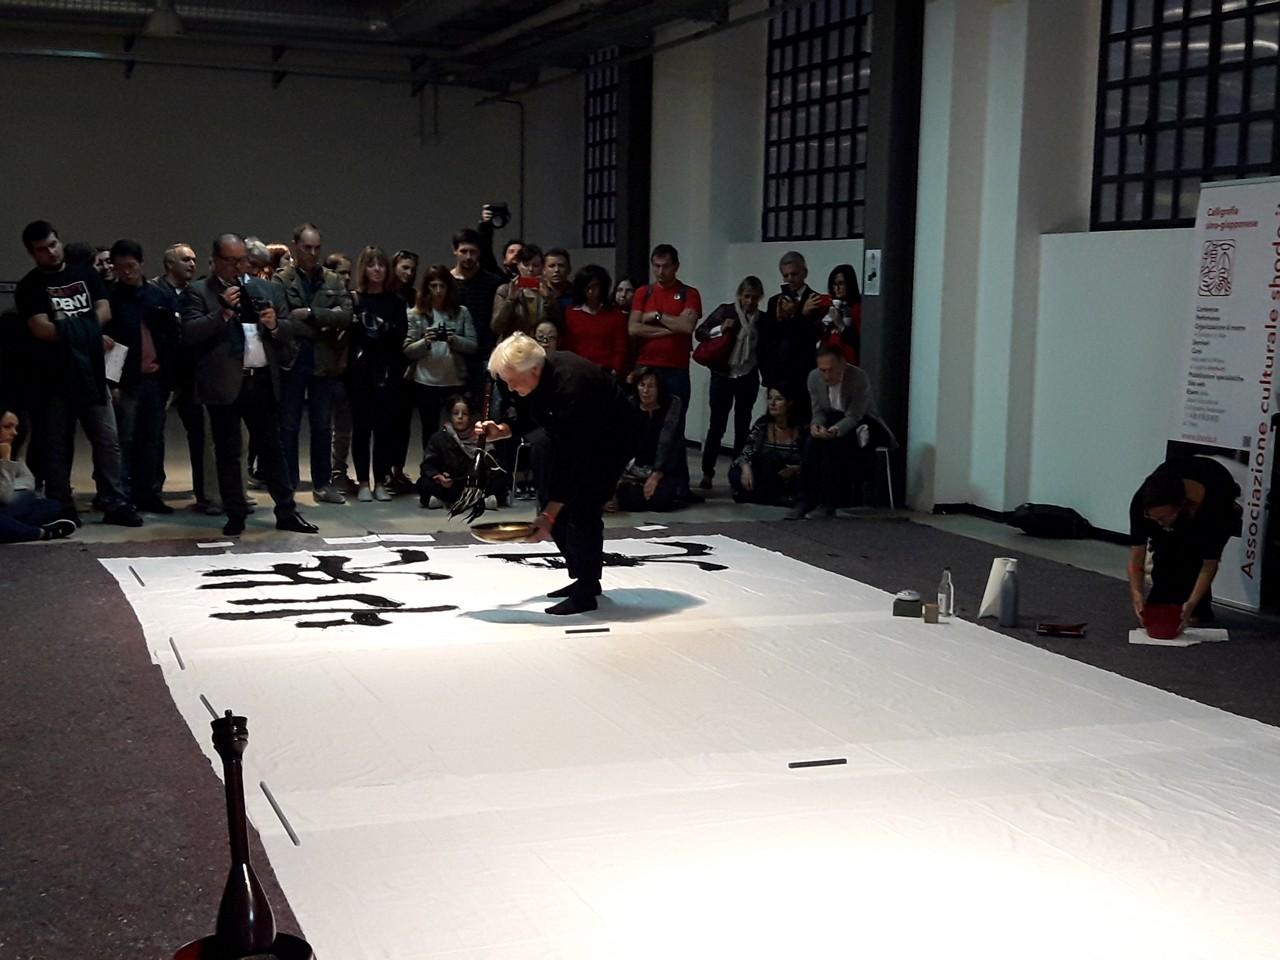 JapanFestival-Milano2018-fotoPagineZeni_015